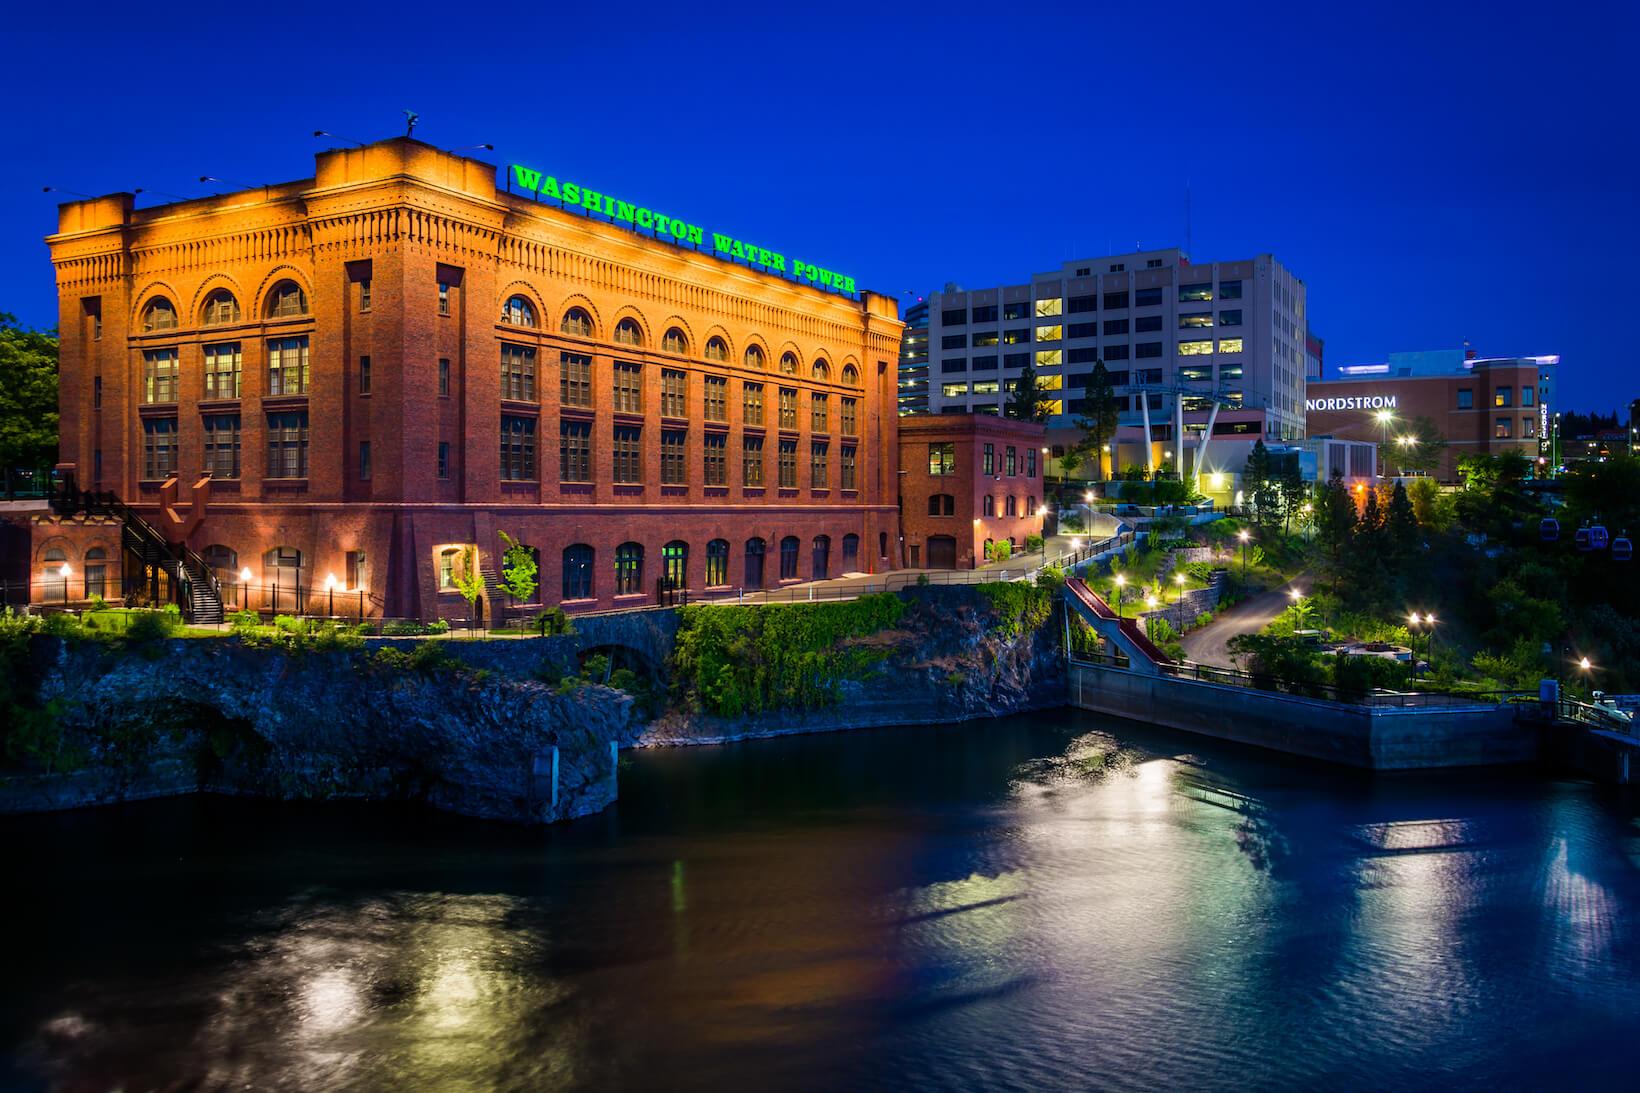 Spokane, WA investment banking